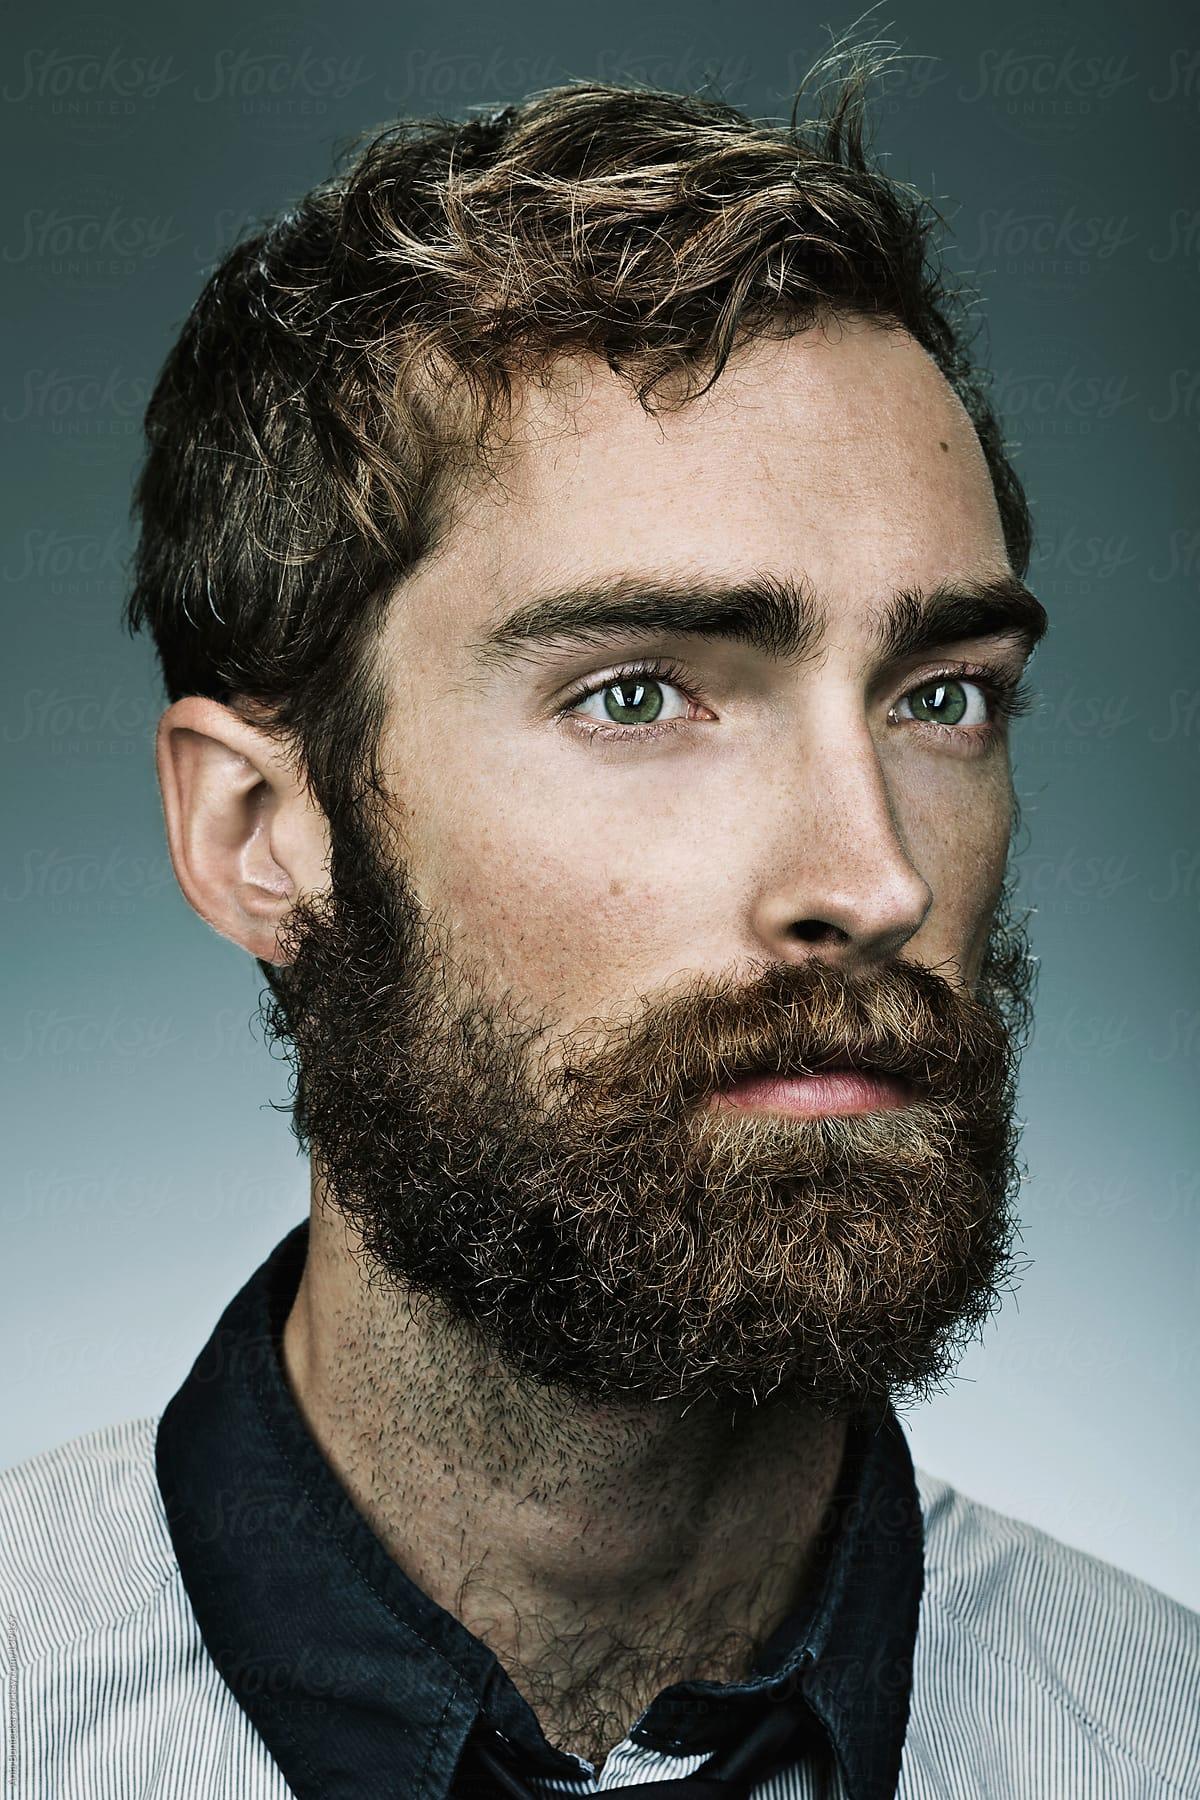 a portrait of a bearded man stocksy united